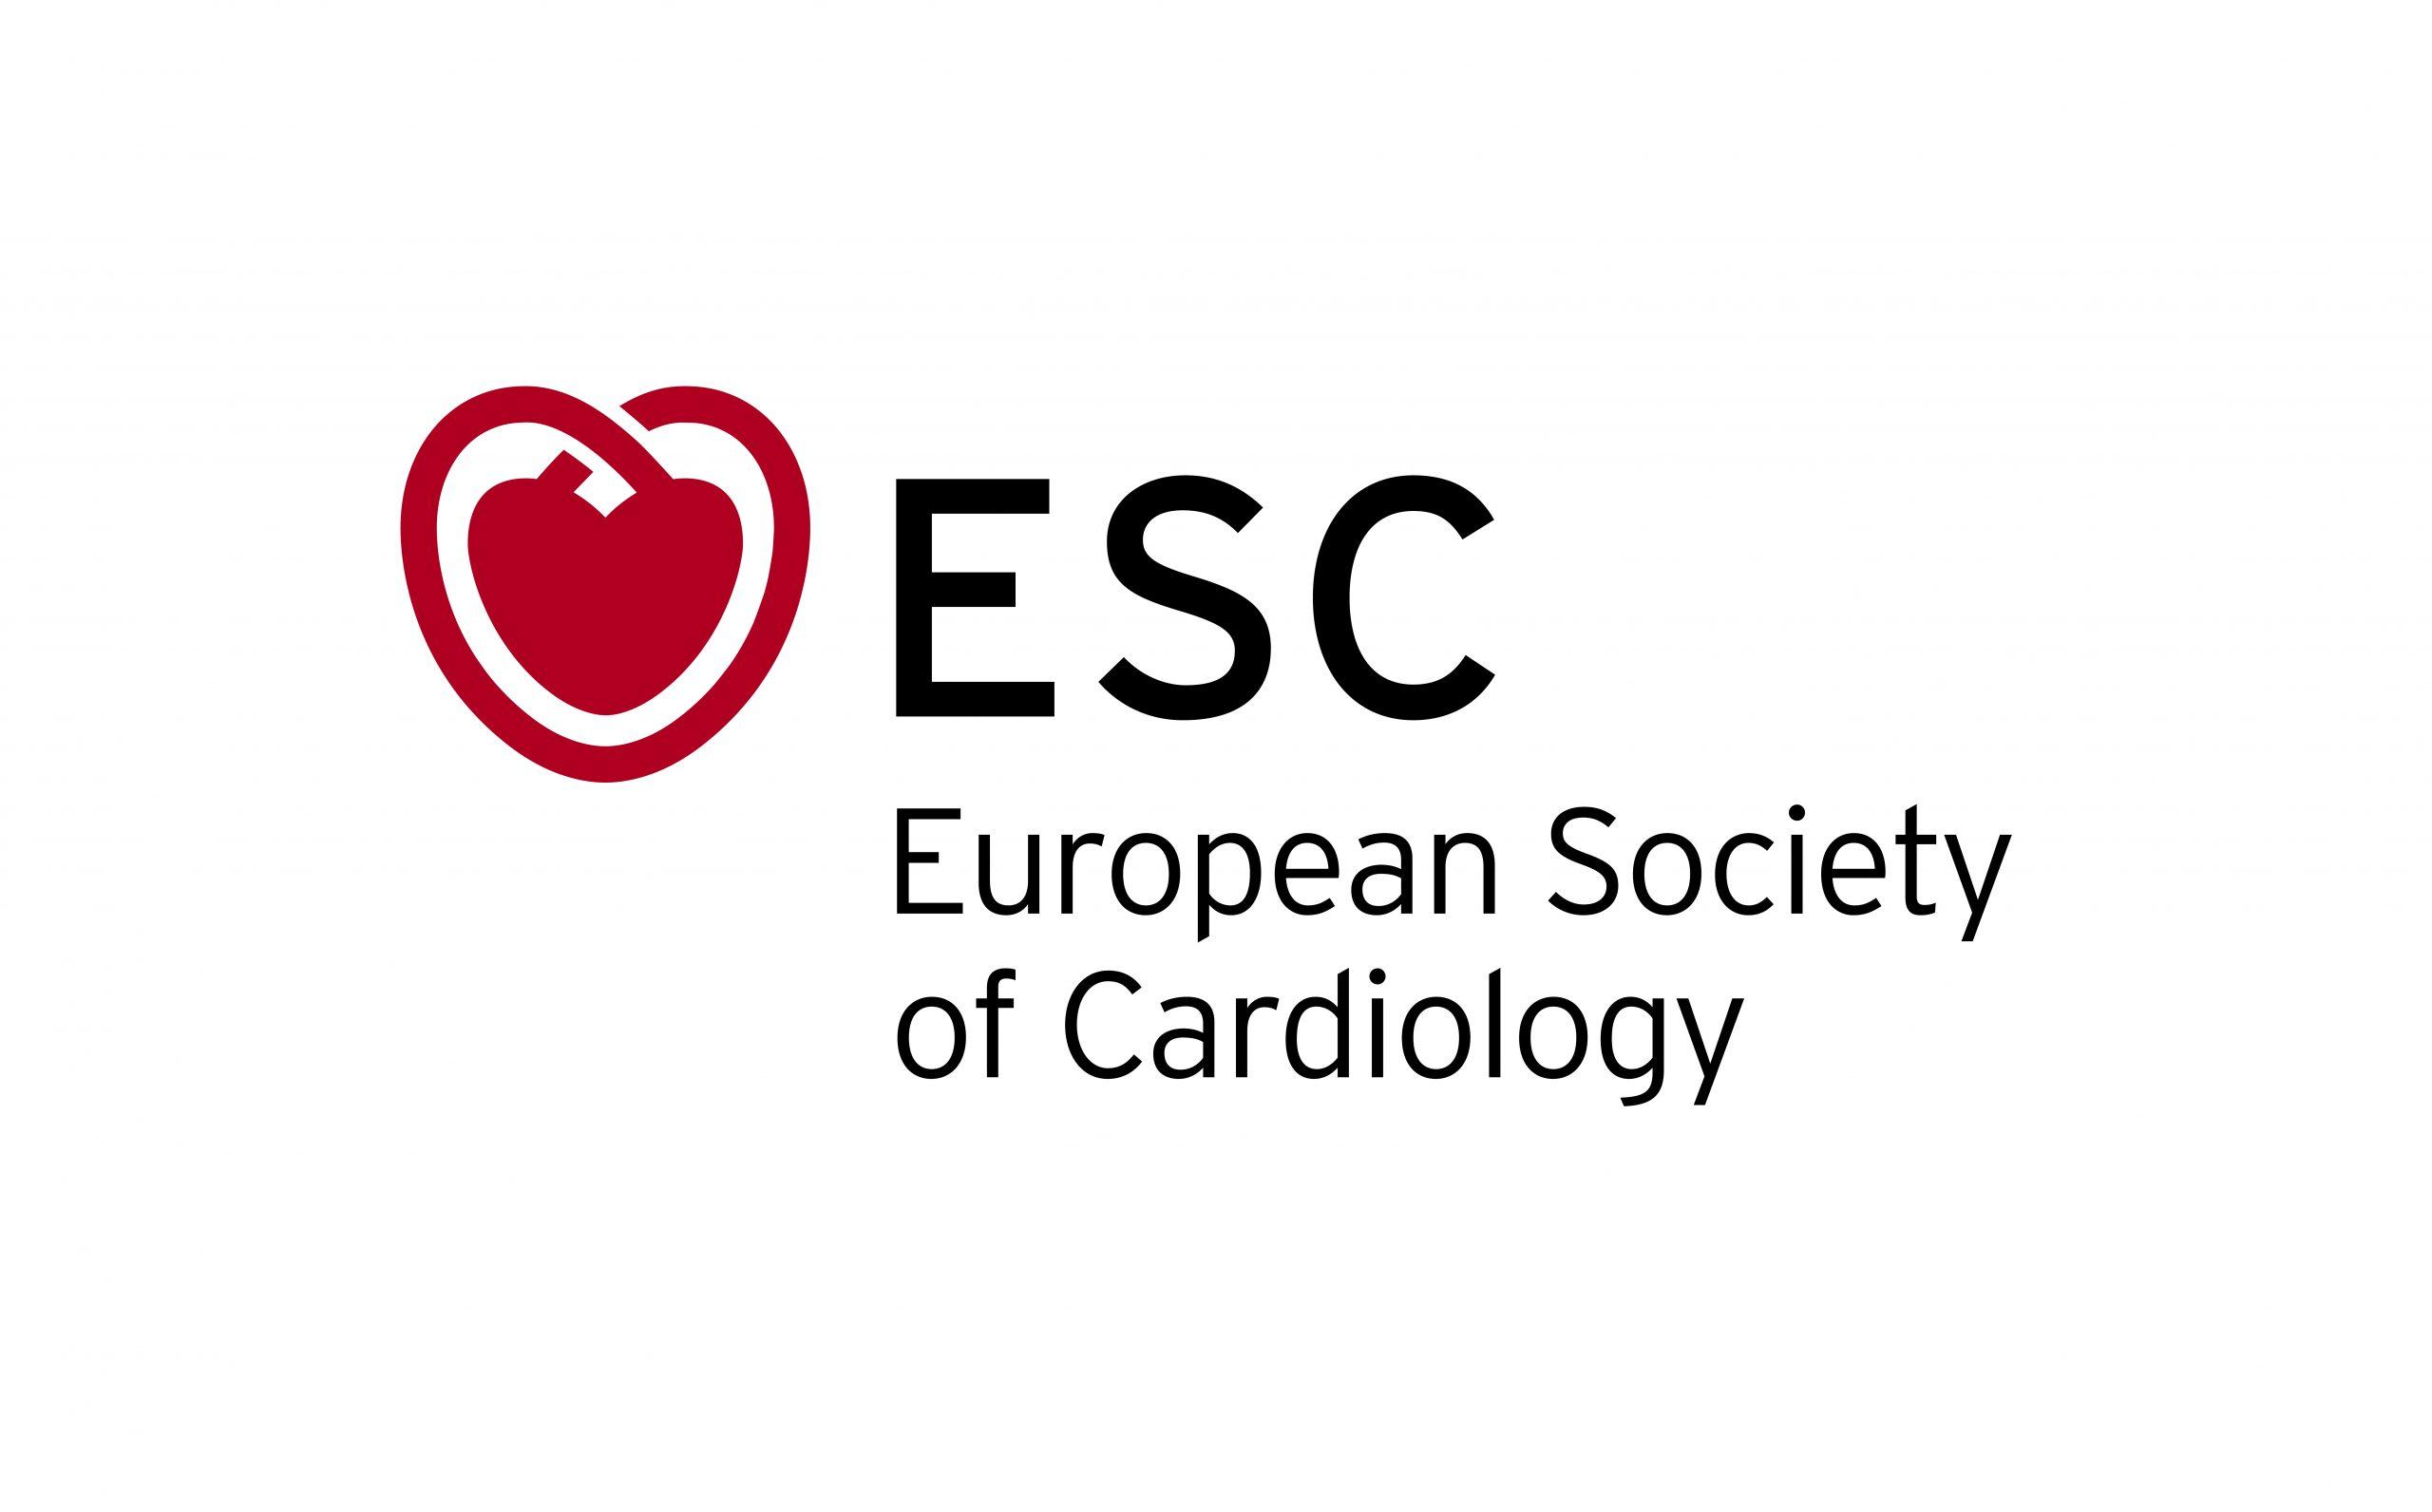 European Society of Cardiology logo